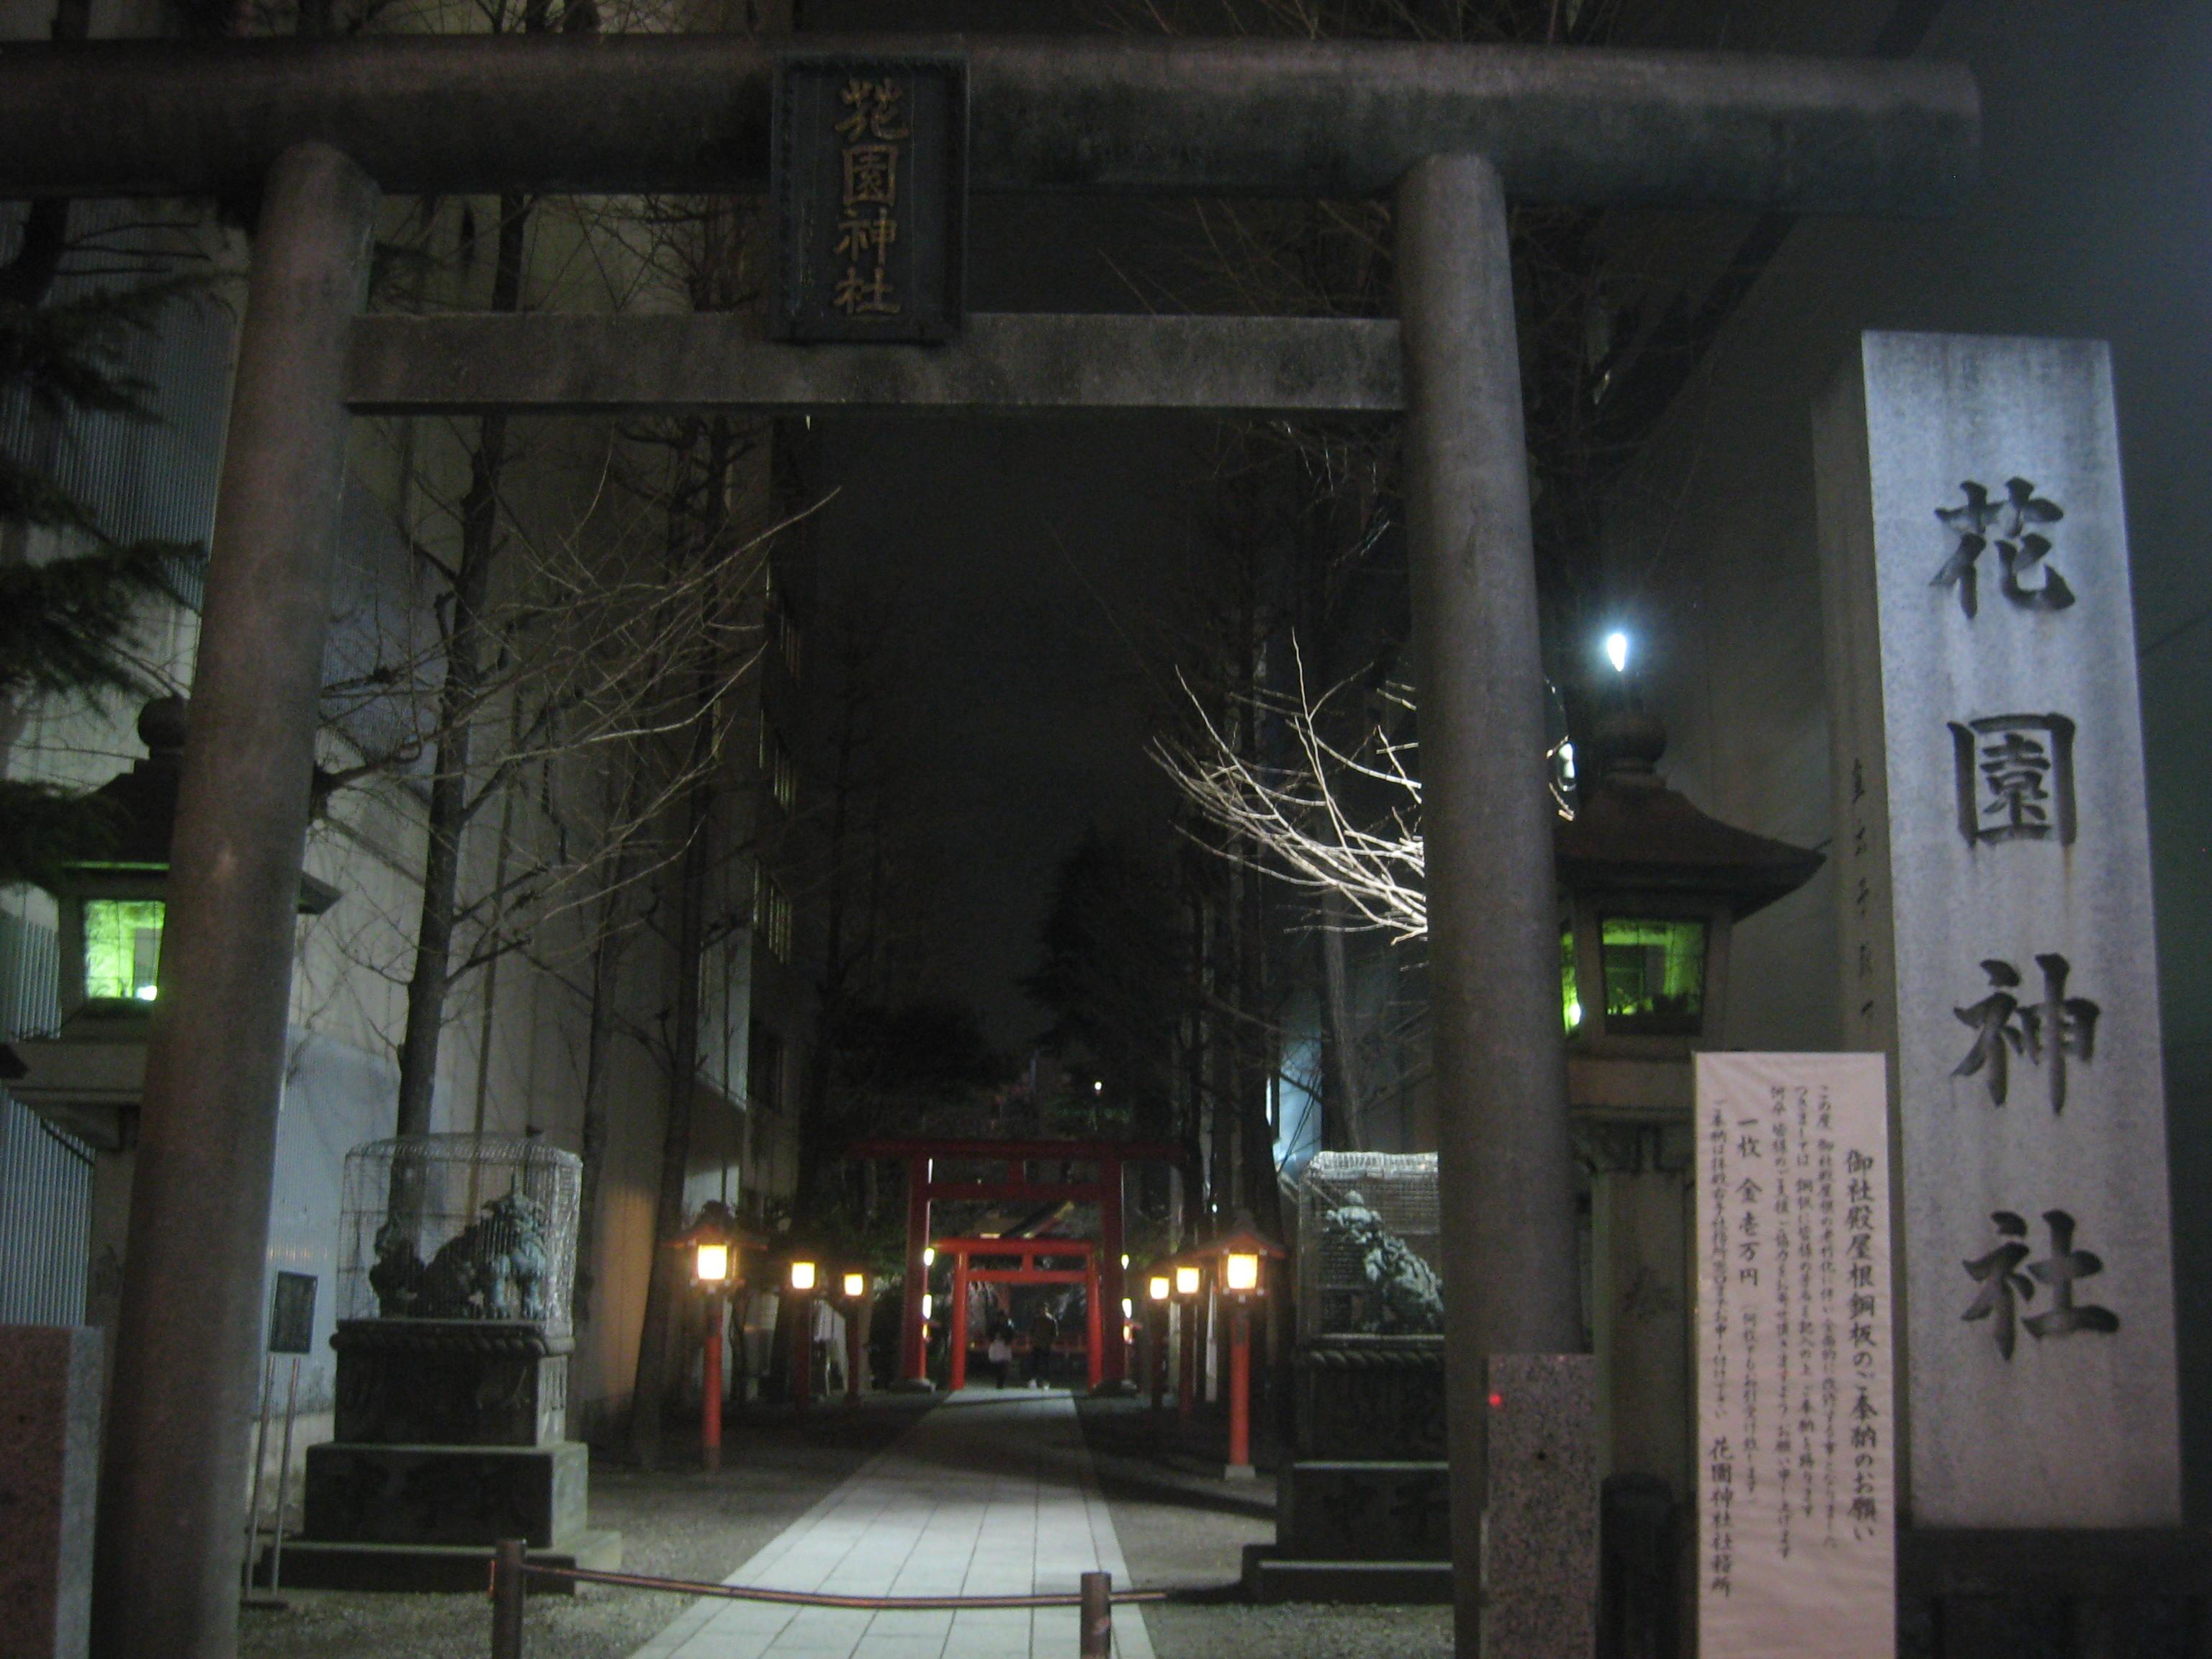 花園神社の桜 神秘的な雰囲気 - 読書日和